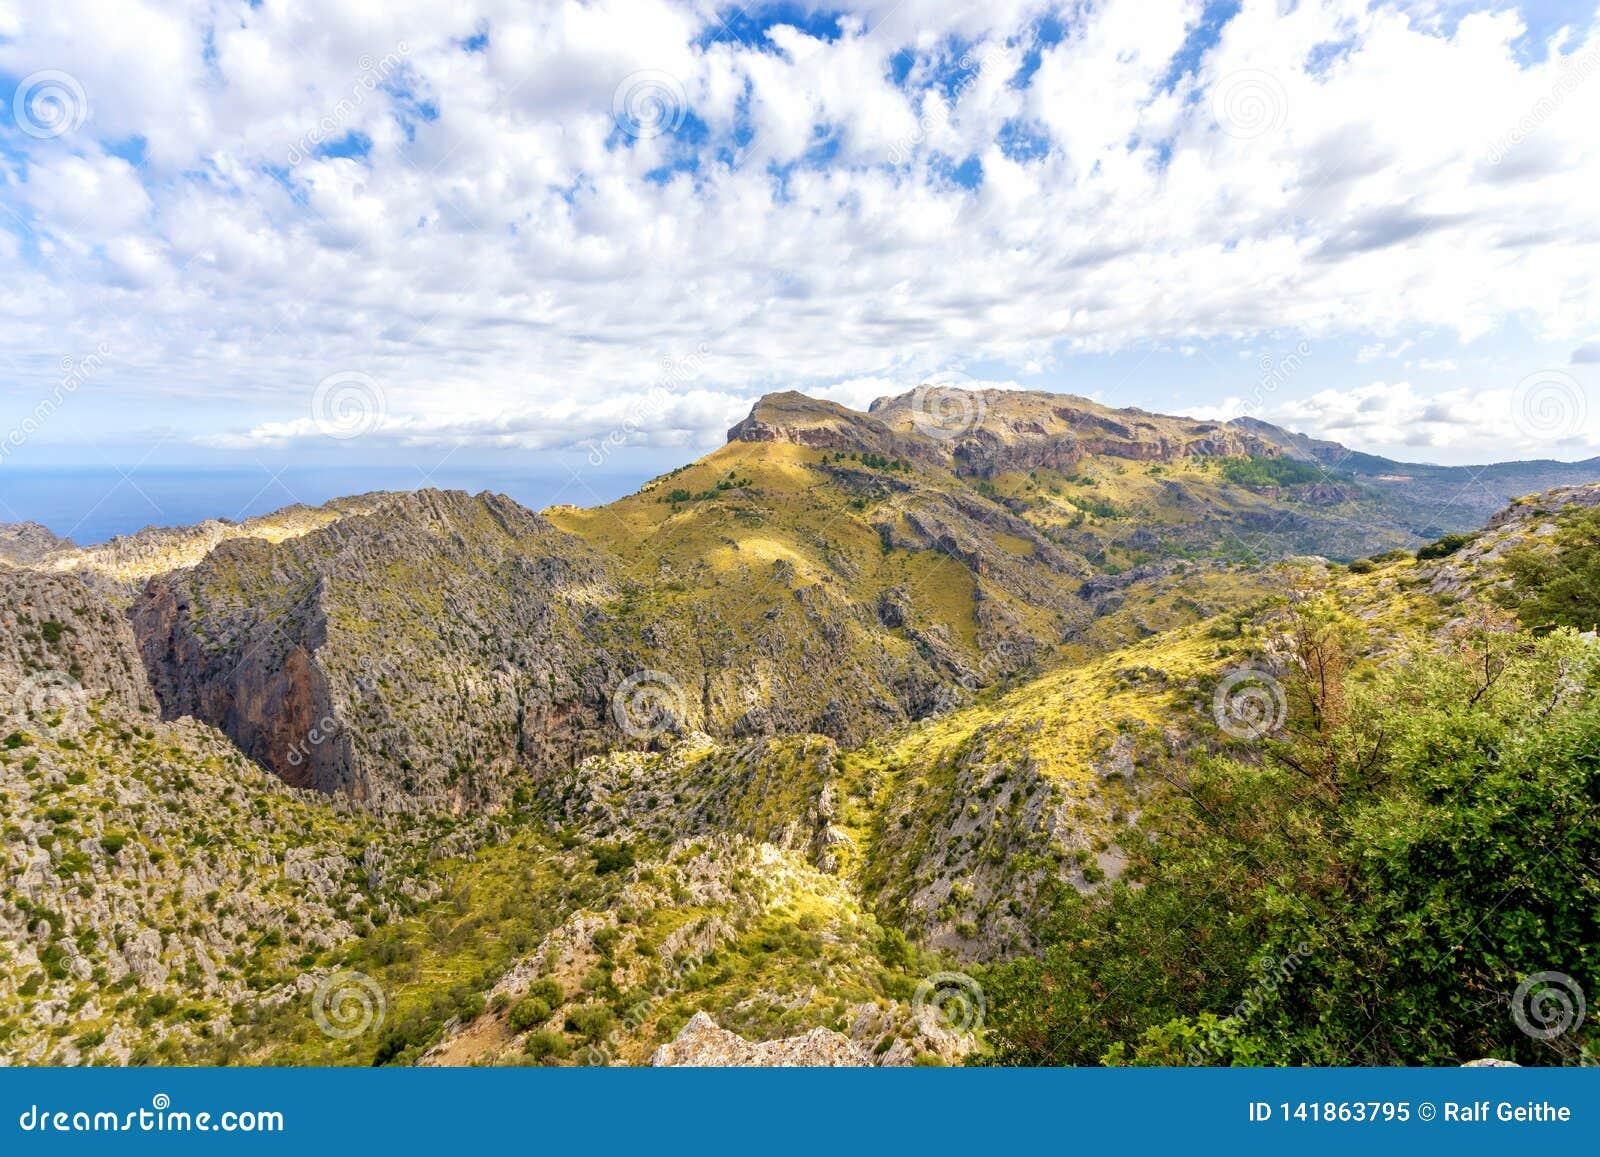 Panorama in the Sierra de Tramuntana